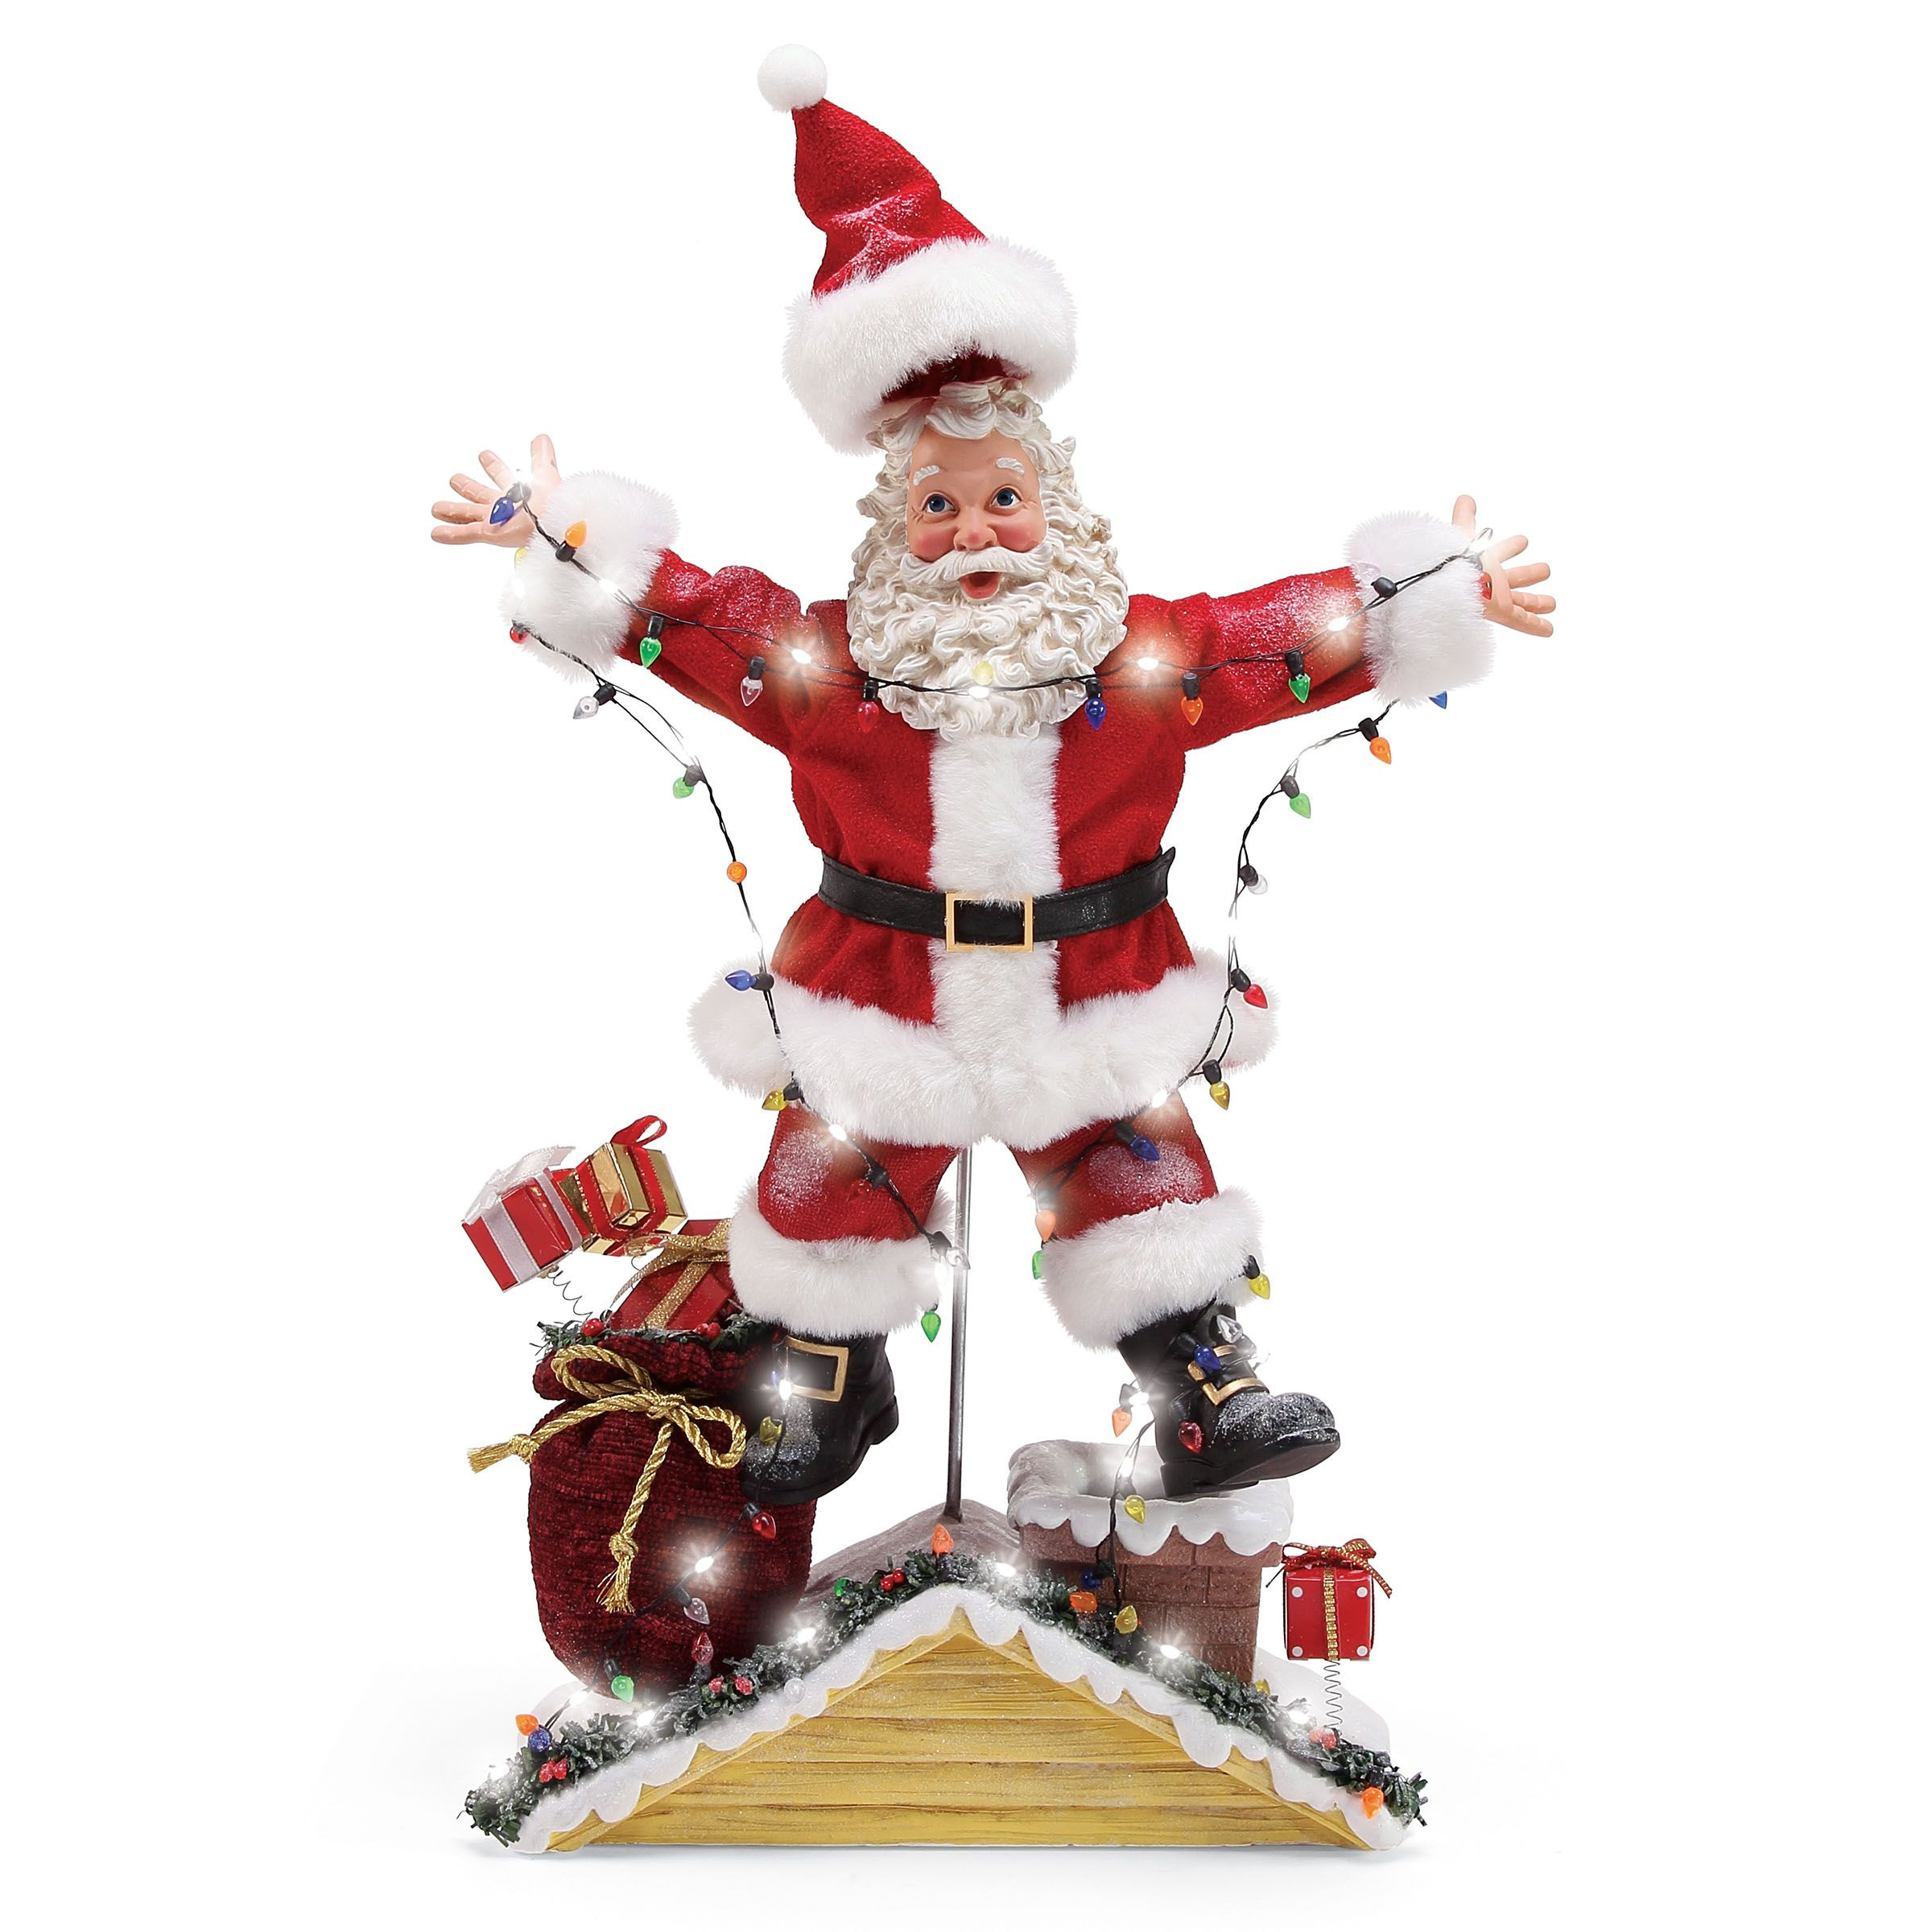 National Lampoons Christmas Vacation Santa | Christmas | Pinterest ...